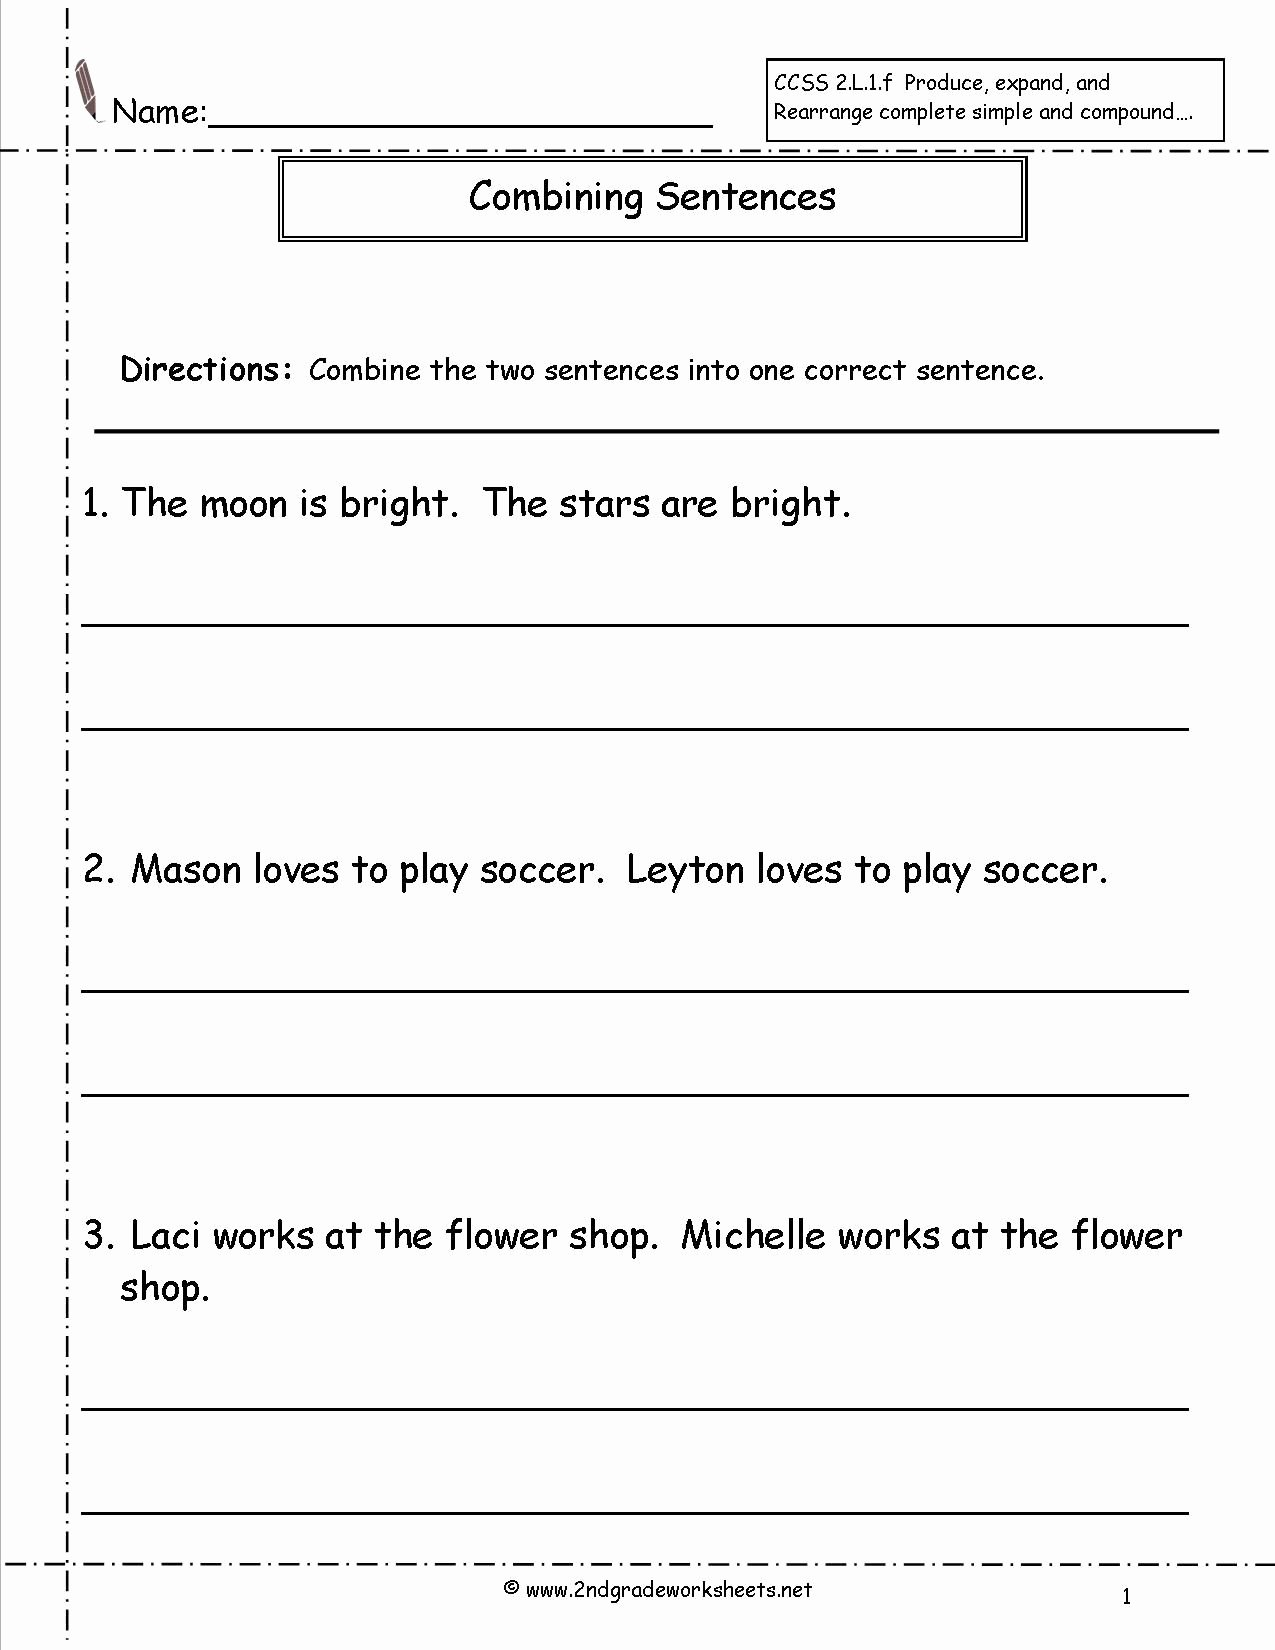 Combining Sentences Worksheet 5th Grade top Bining Sentences Worksheet